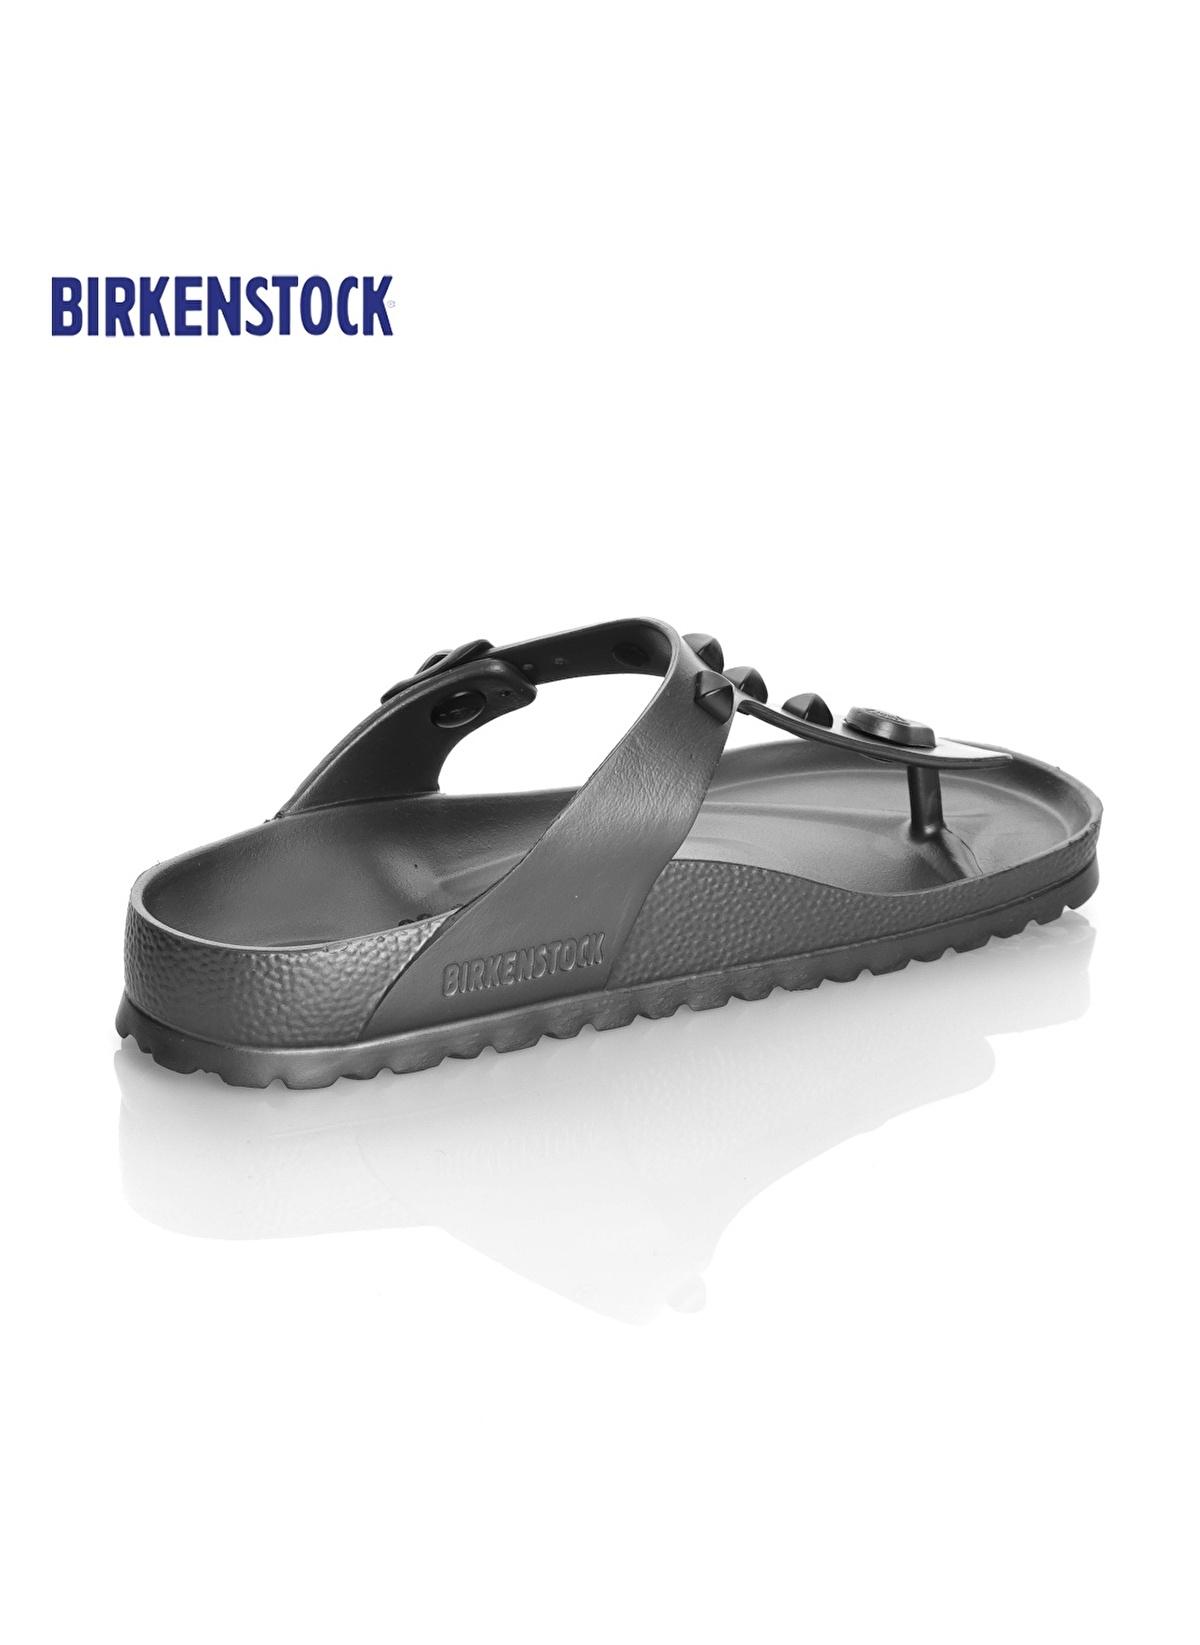 60dce1fbf20 Birkenstock Terlik Antrasit  Birkenstock Terlik Antrasit  Birkenstock Terlik  Antrasit ...